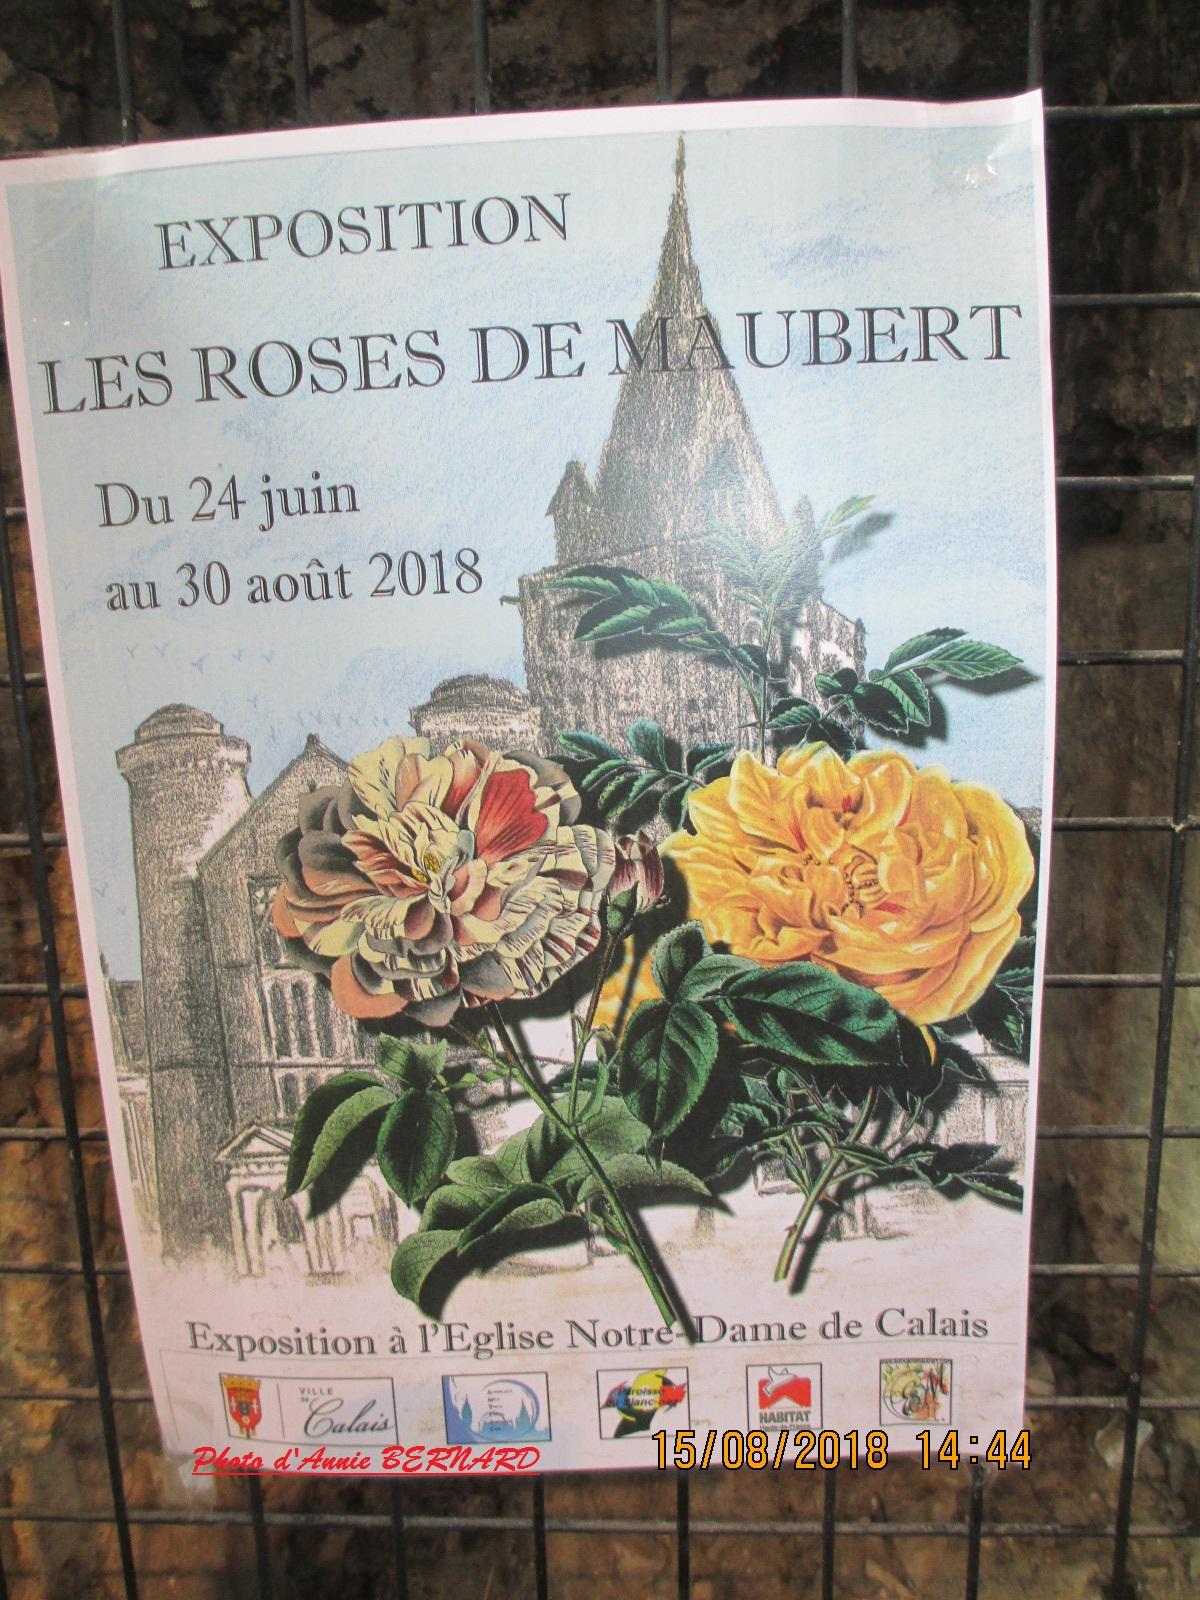 Exposition: Les roses de Maubert